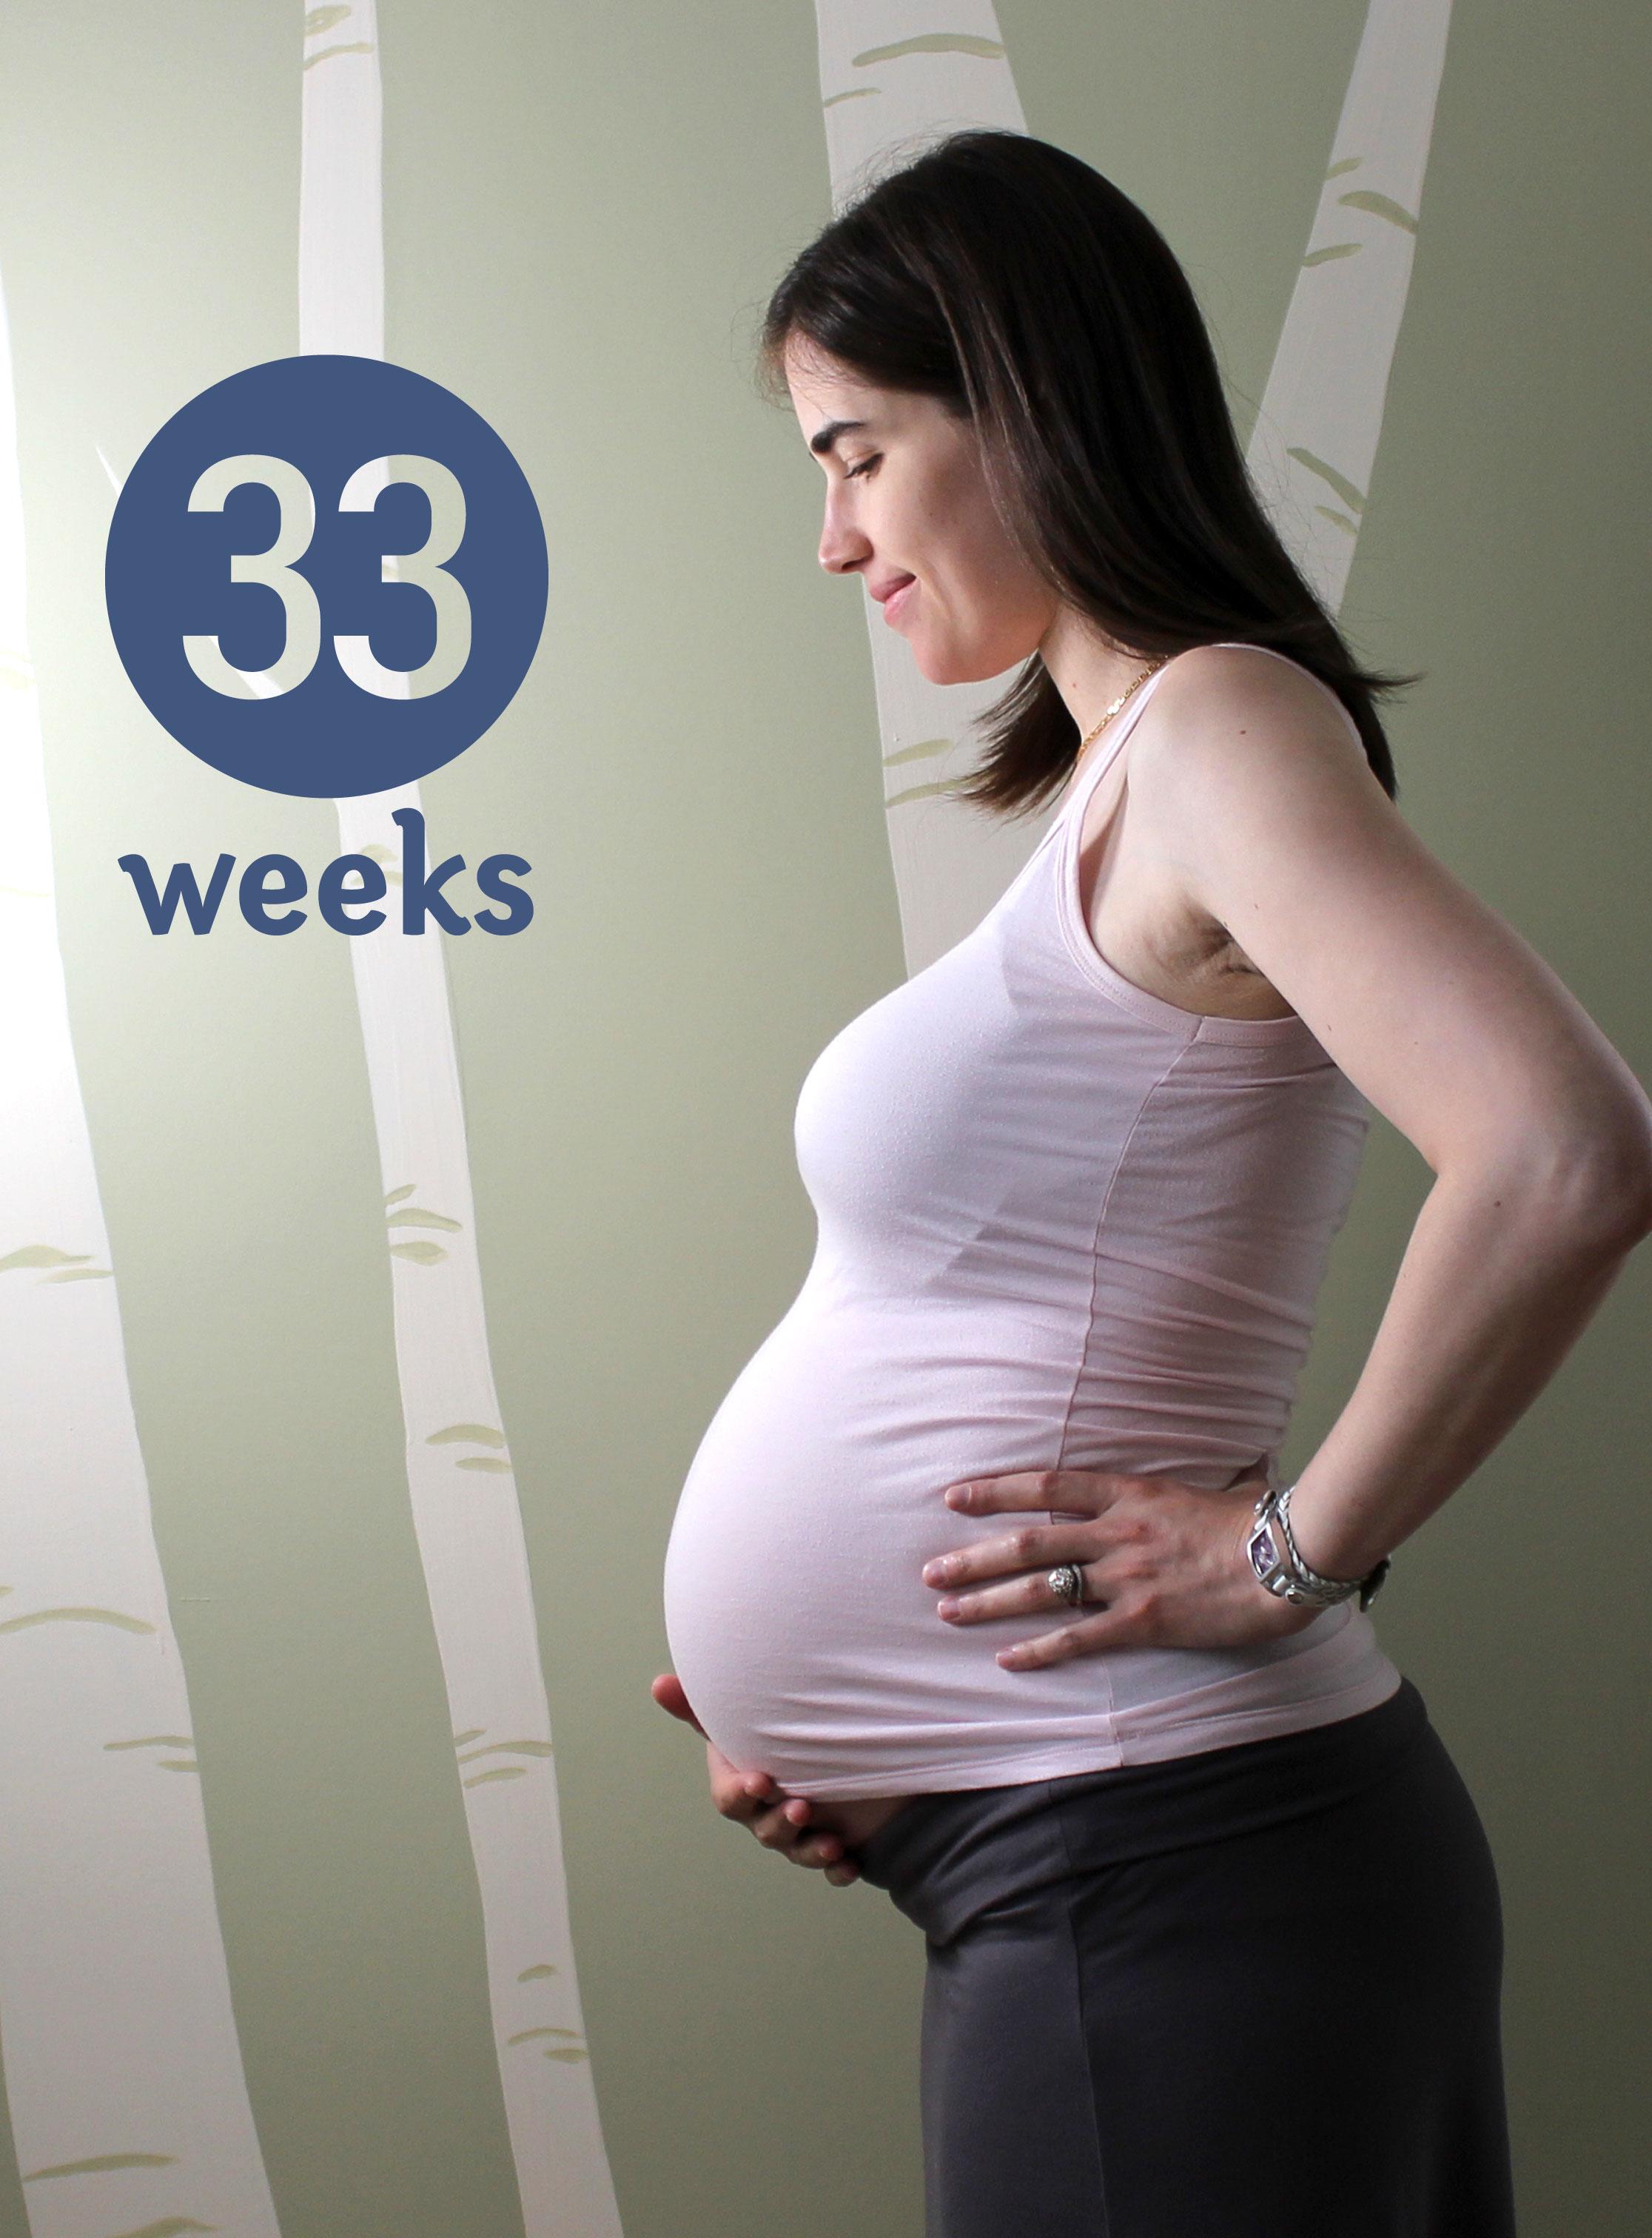 33weeks pregnant - Twiniversity